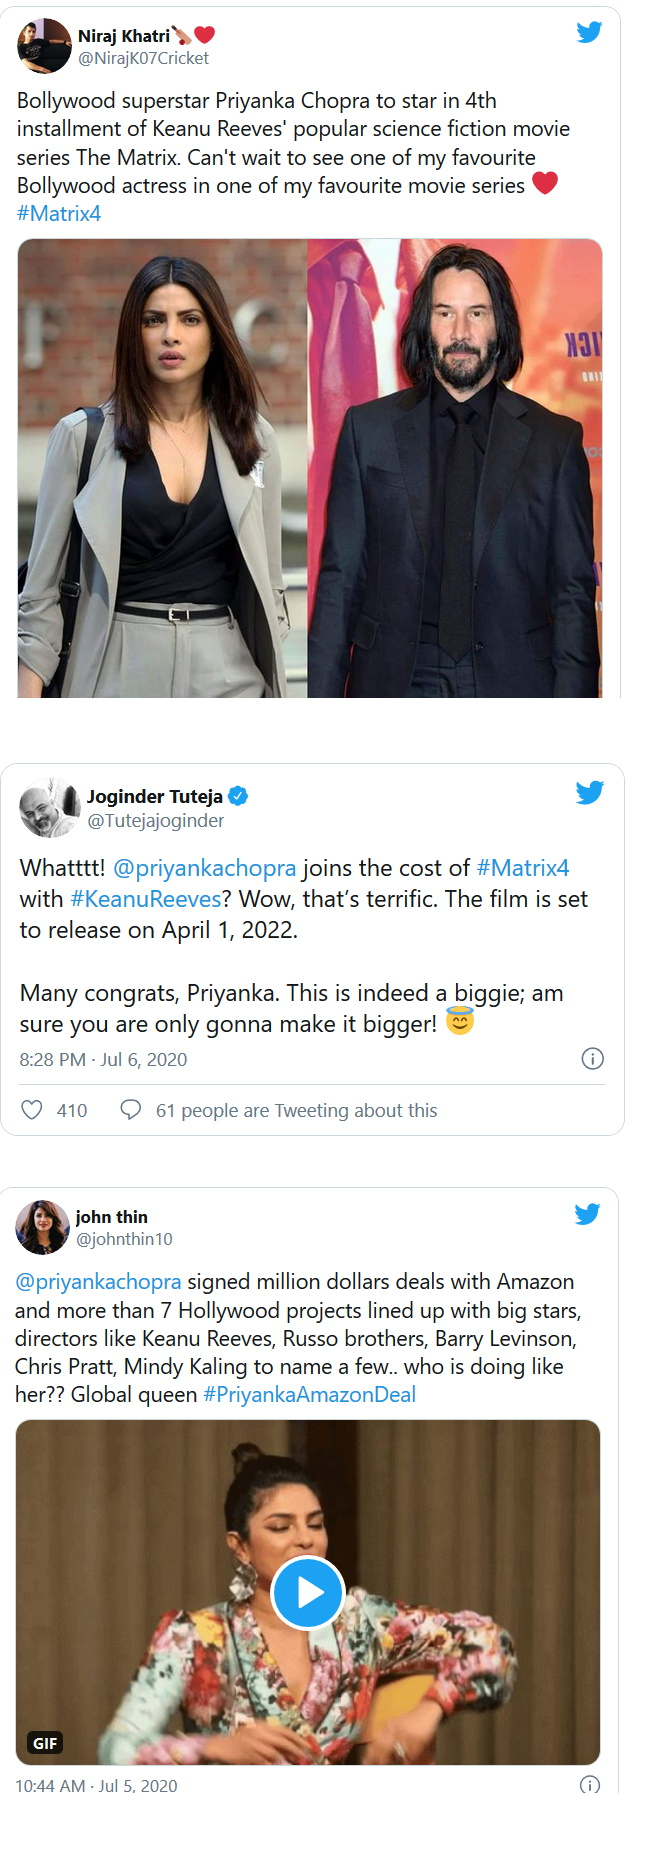 Priyanka Chopra Jonas to star in Matrix 4